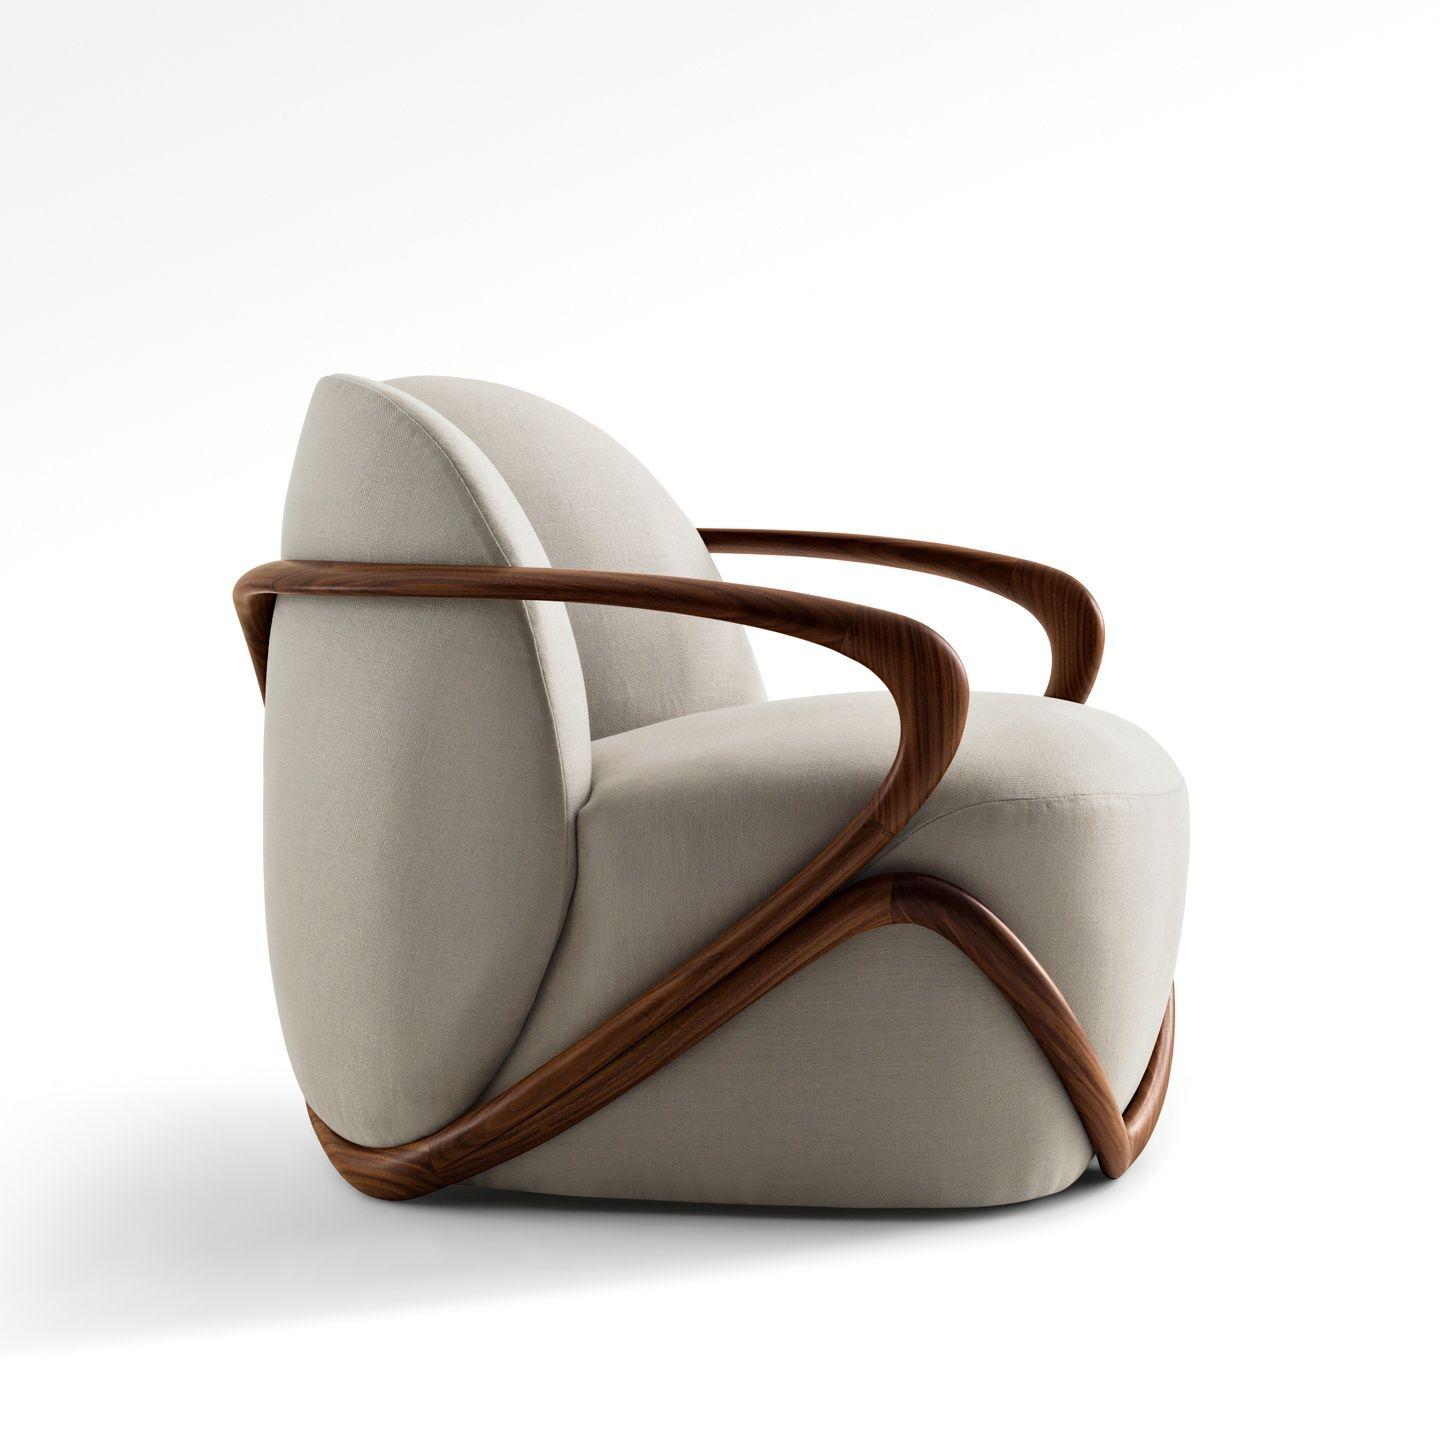 Lounge Chairs: Hug Armchair By Giorgetti U2014 ECC Lighting U0026 Furniture